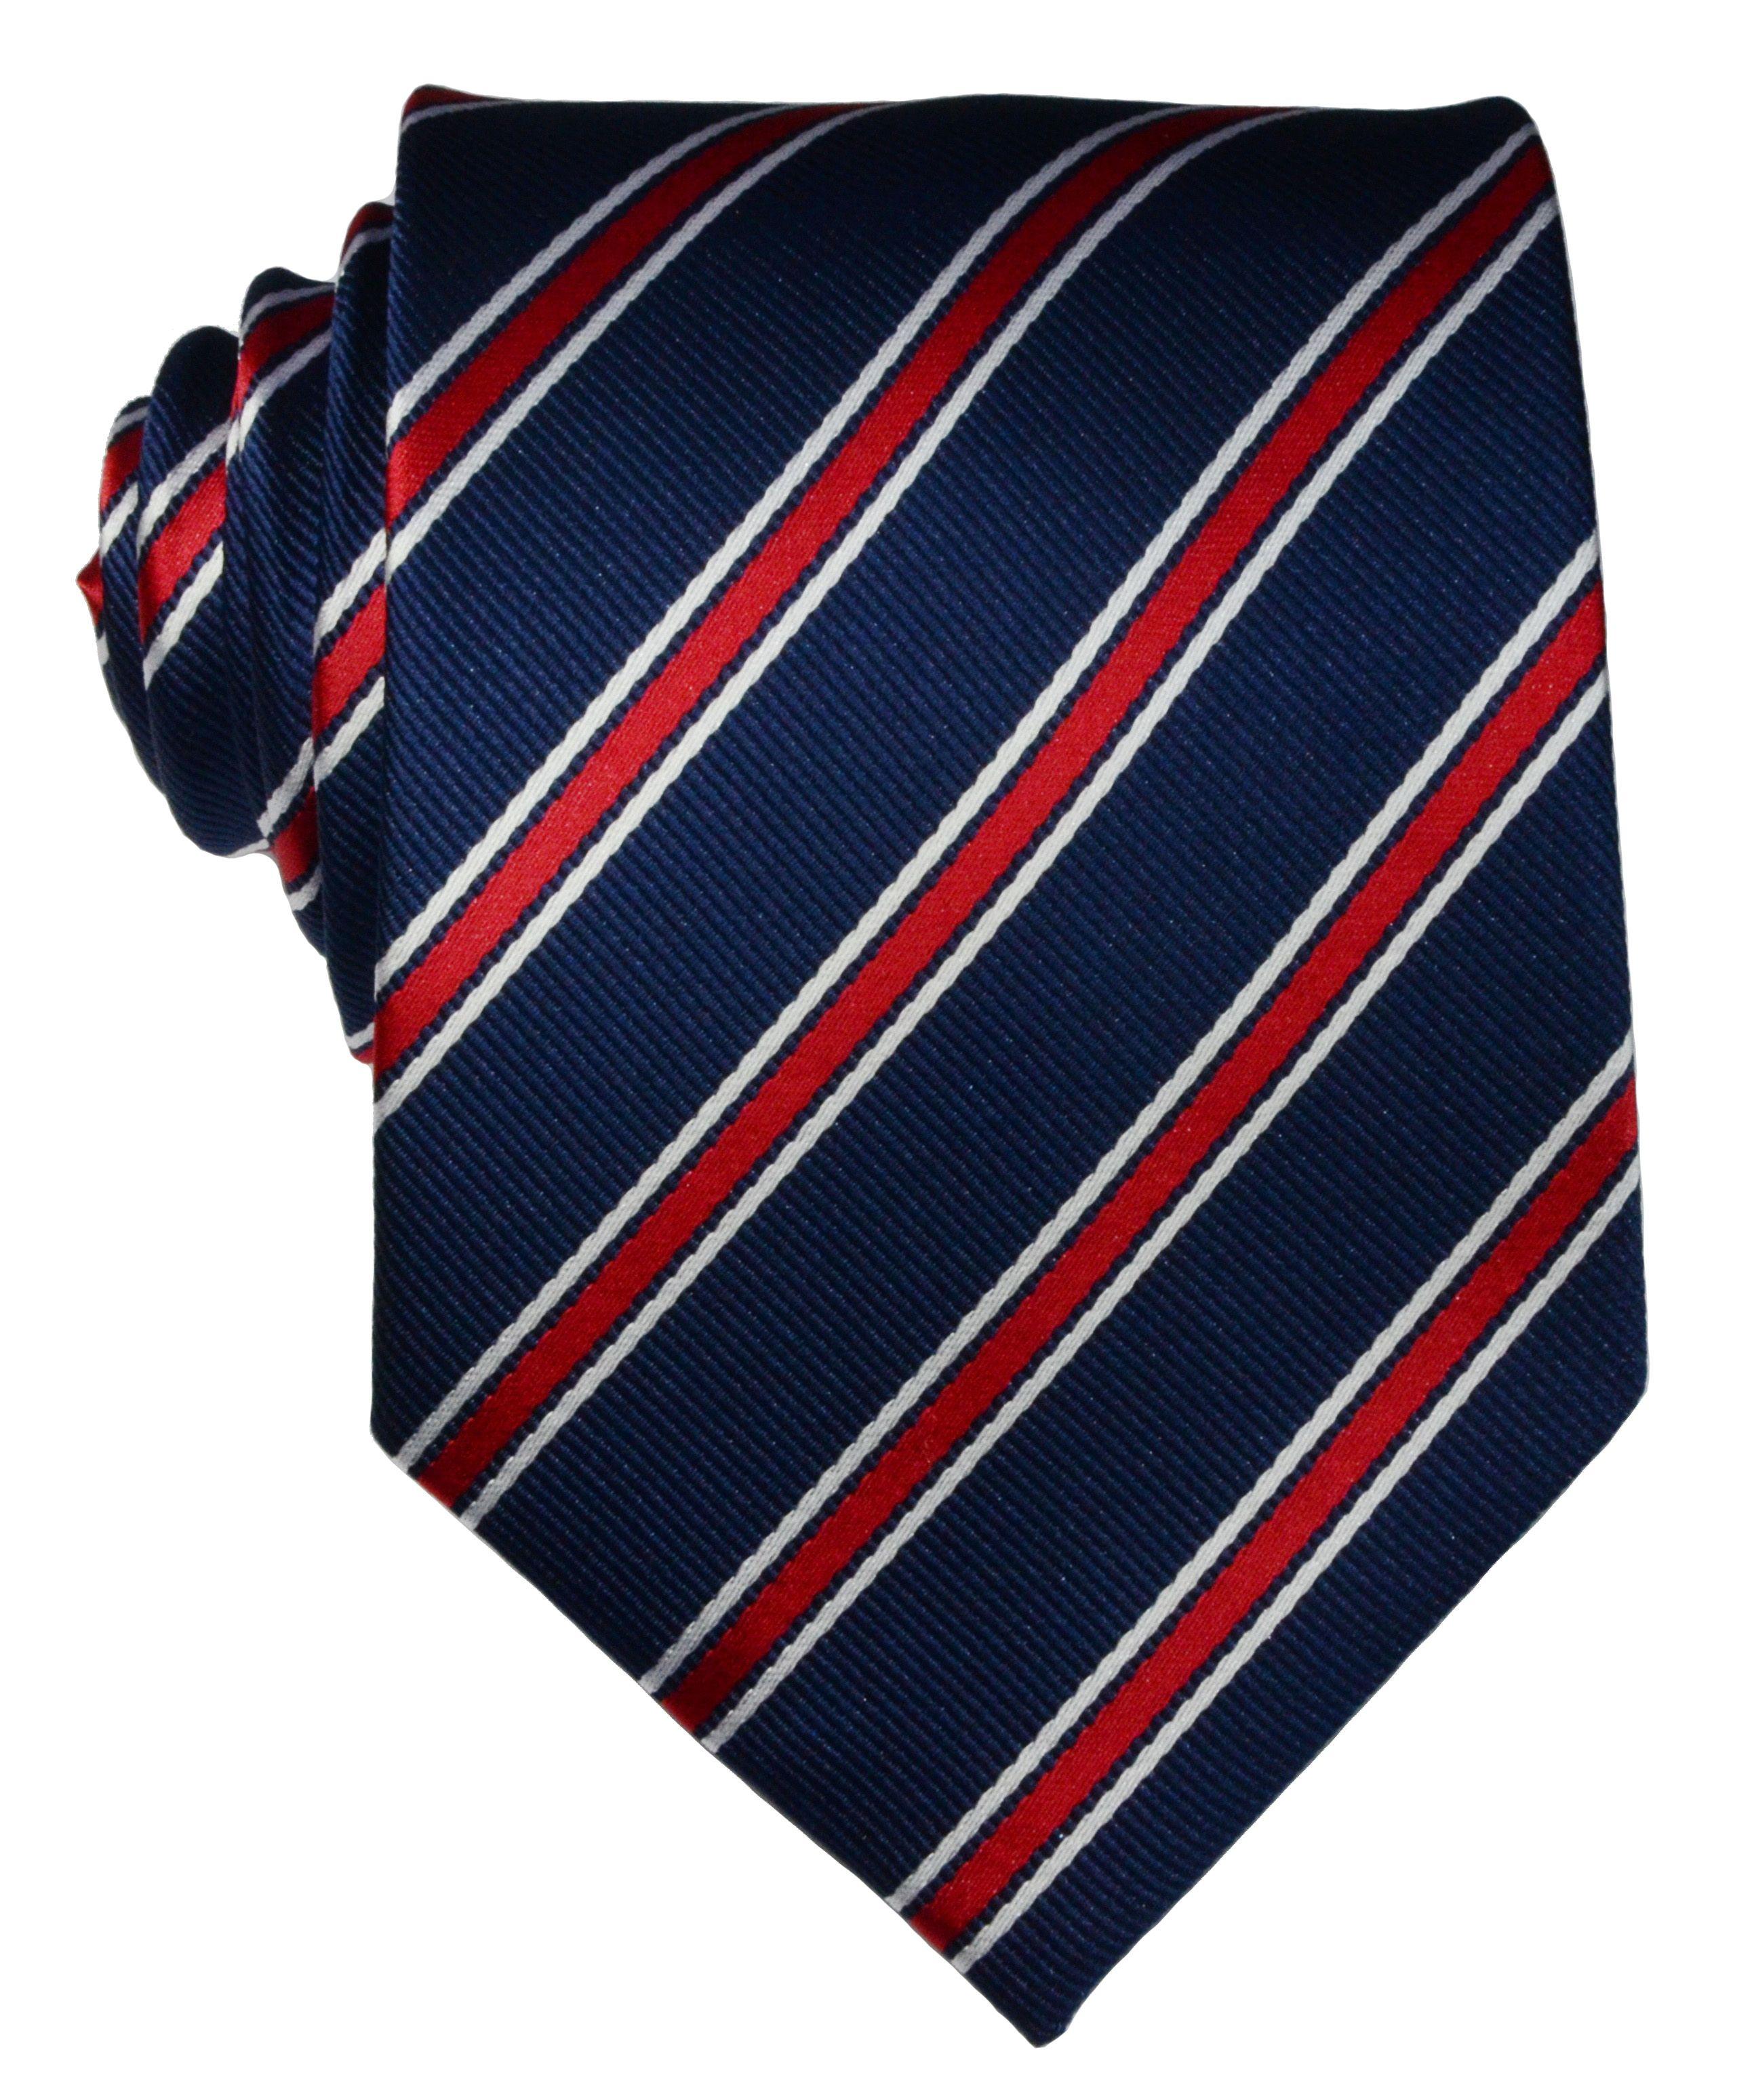 New Classic Stripes Gray Beige Gold JACQUARD WOVEN 100/% Silk Men/'s Tie Necktie